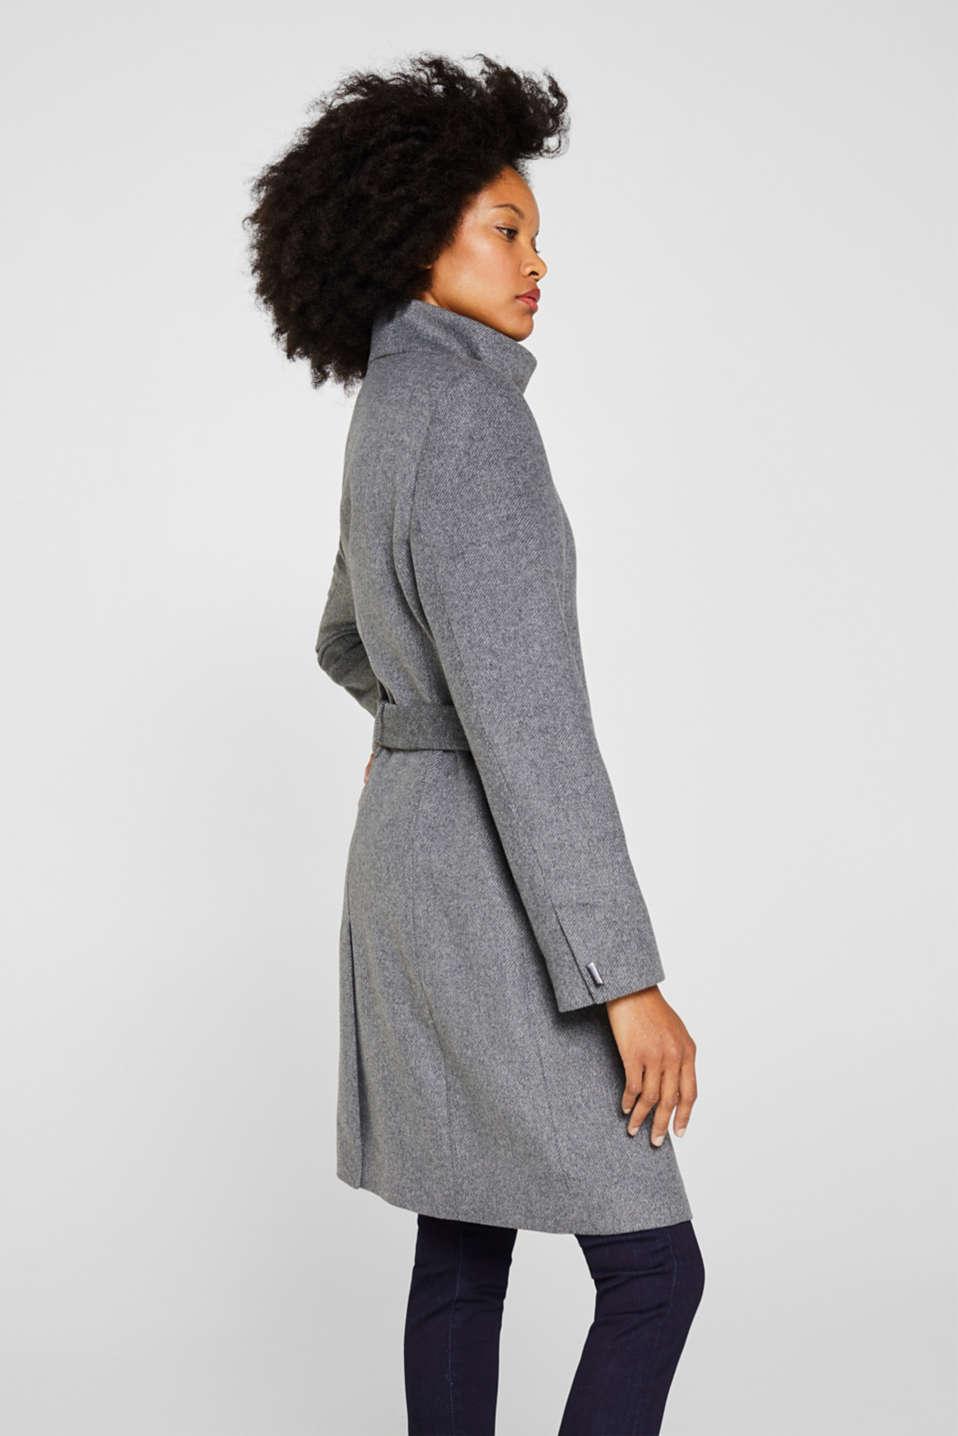 With wool: Coat with tie-around belt, GUNMETAL 5, detail image number 5